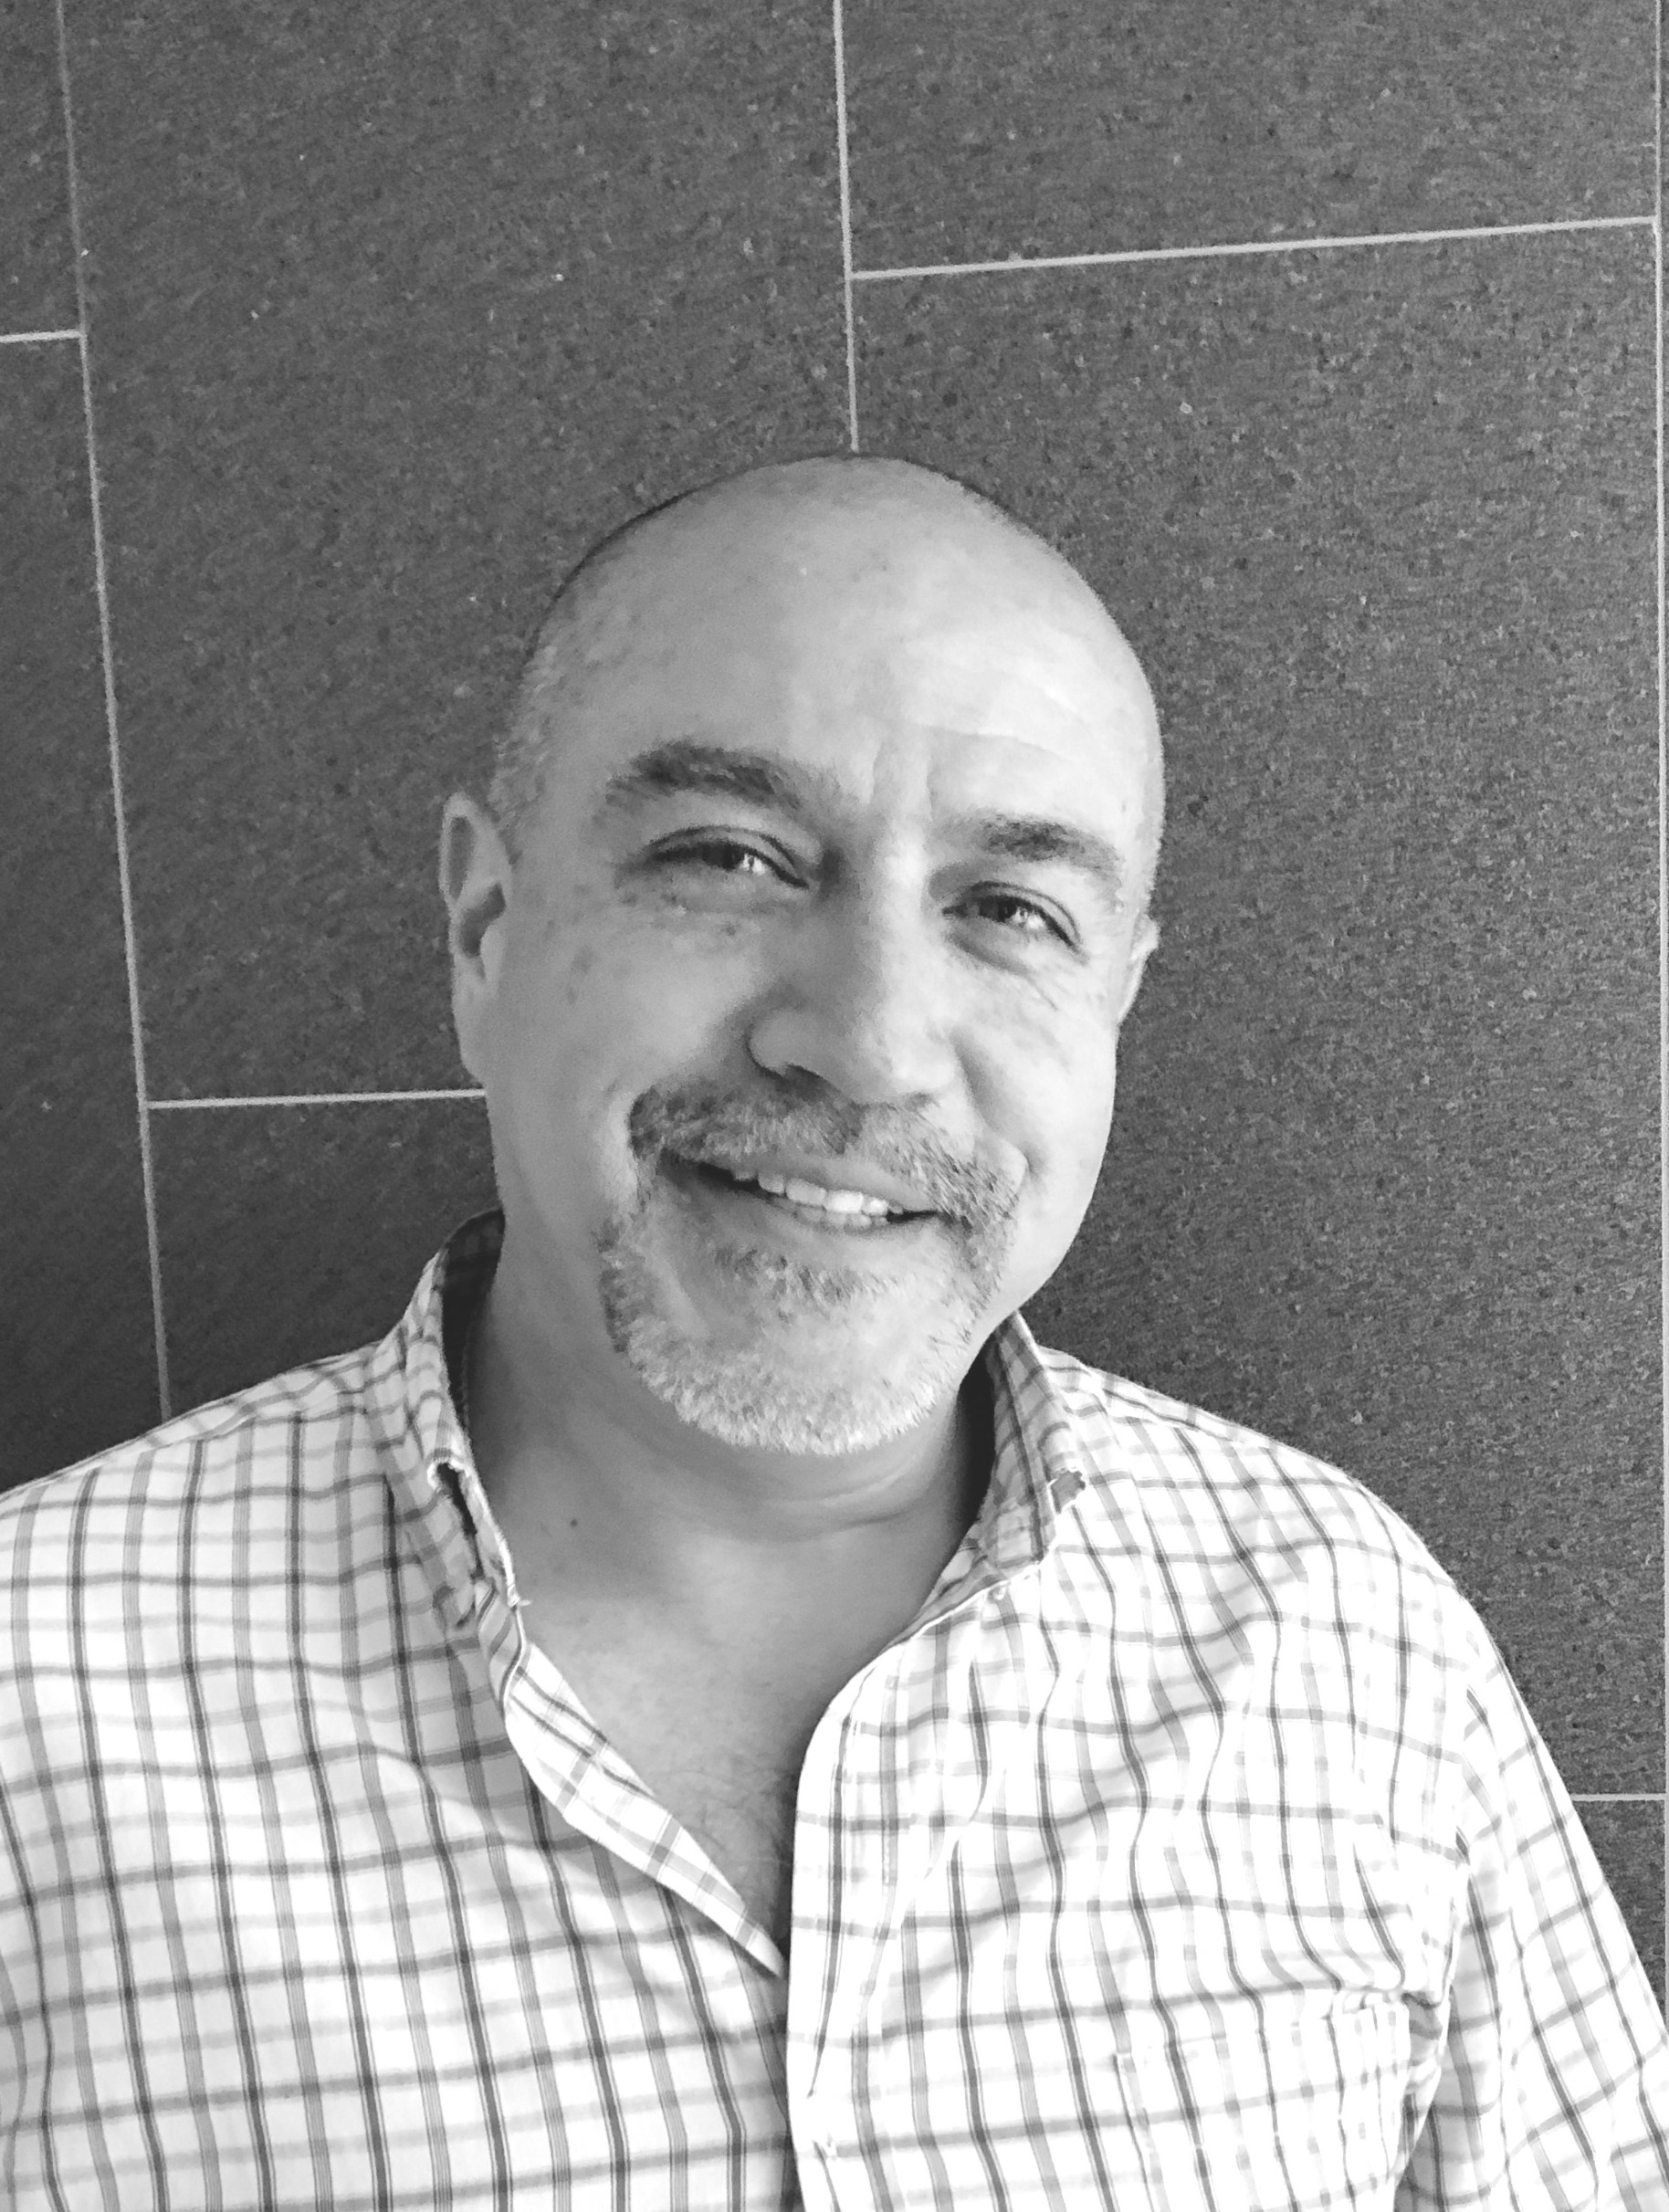 Jose Alberto Bejarano